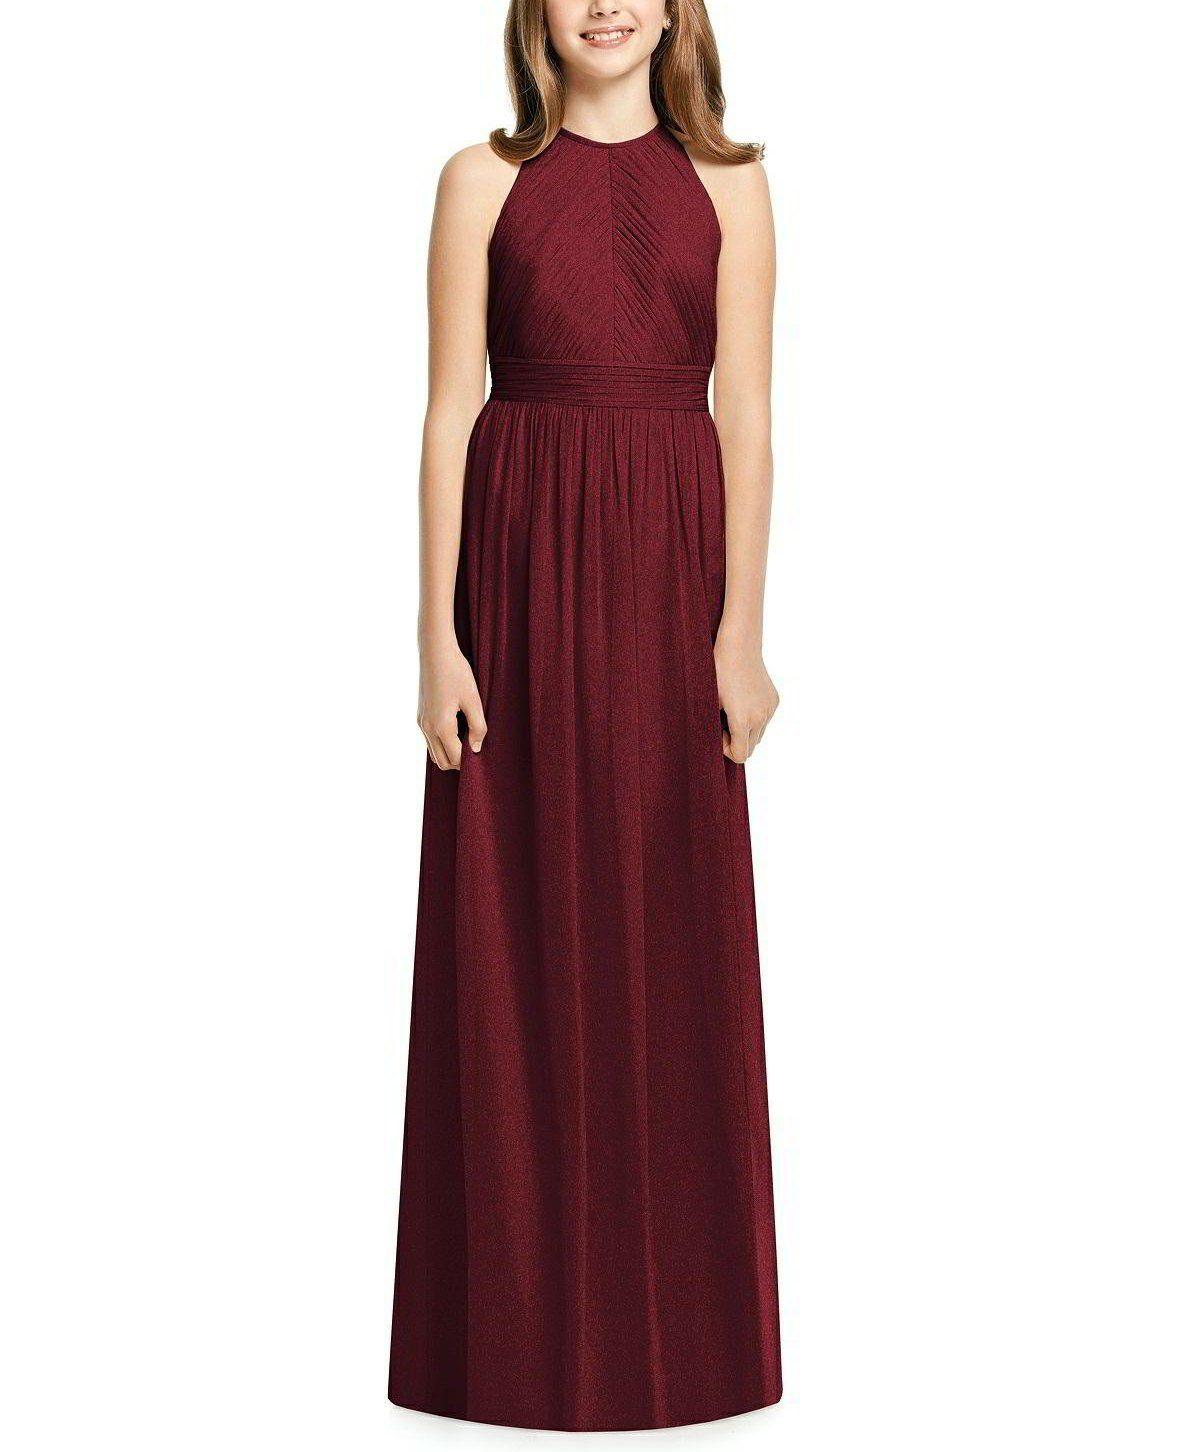 d3b4ef9f68 Description - Dessy Collection Junior Bridesmaid Style JR539 - Full length bridesmaid  dress - Junior version